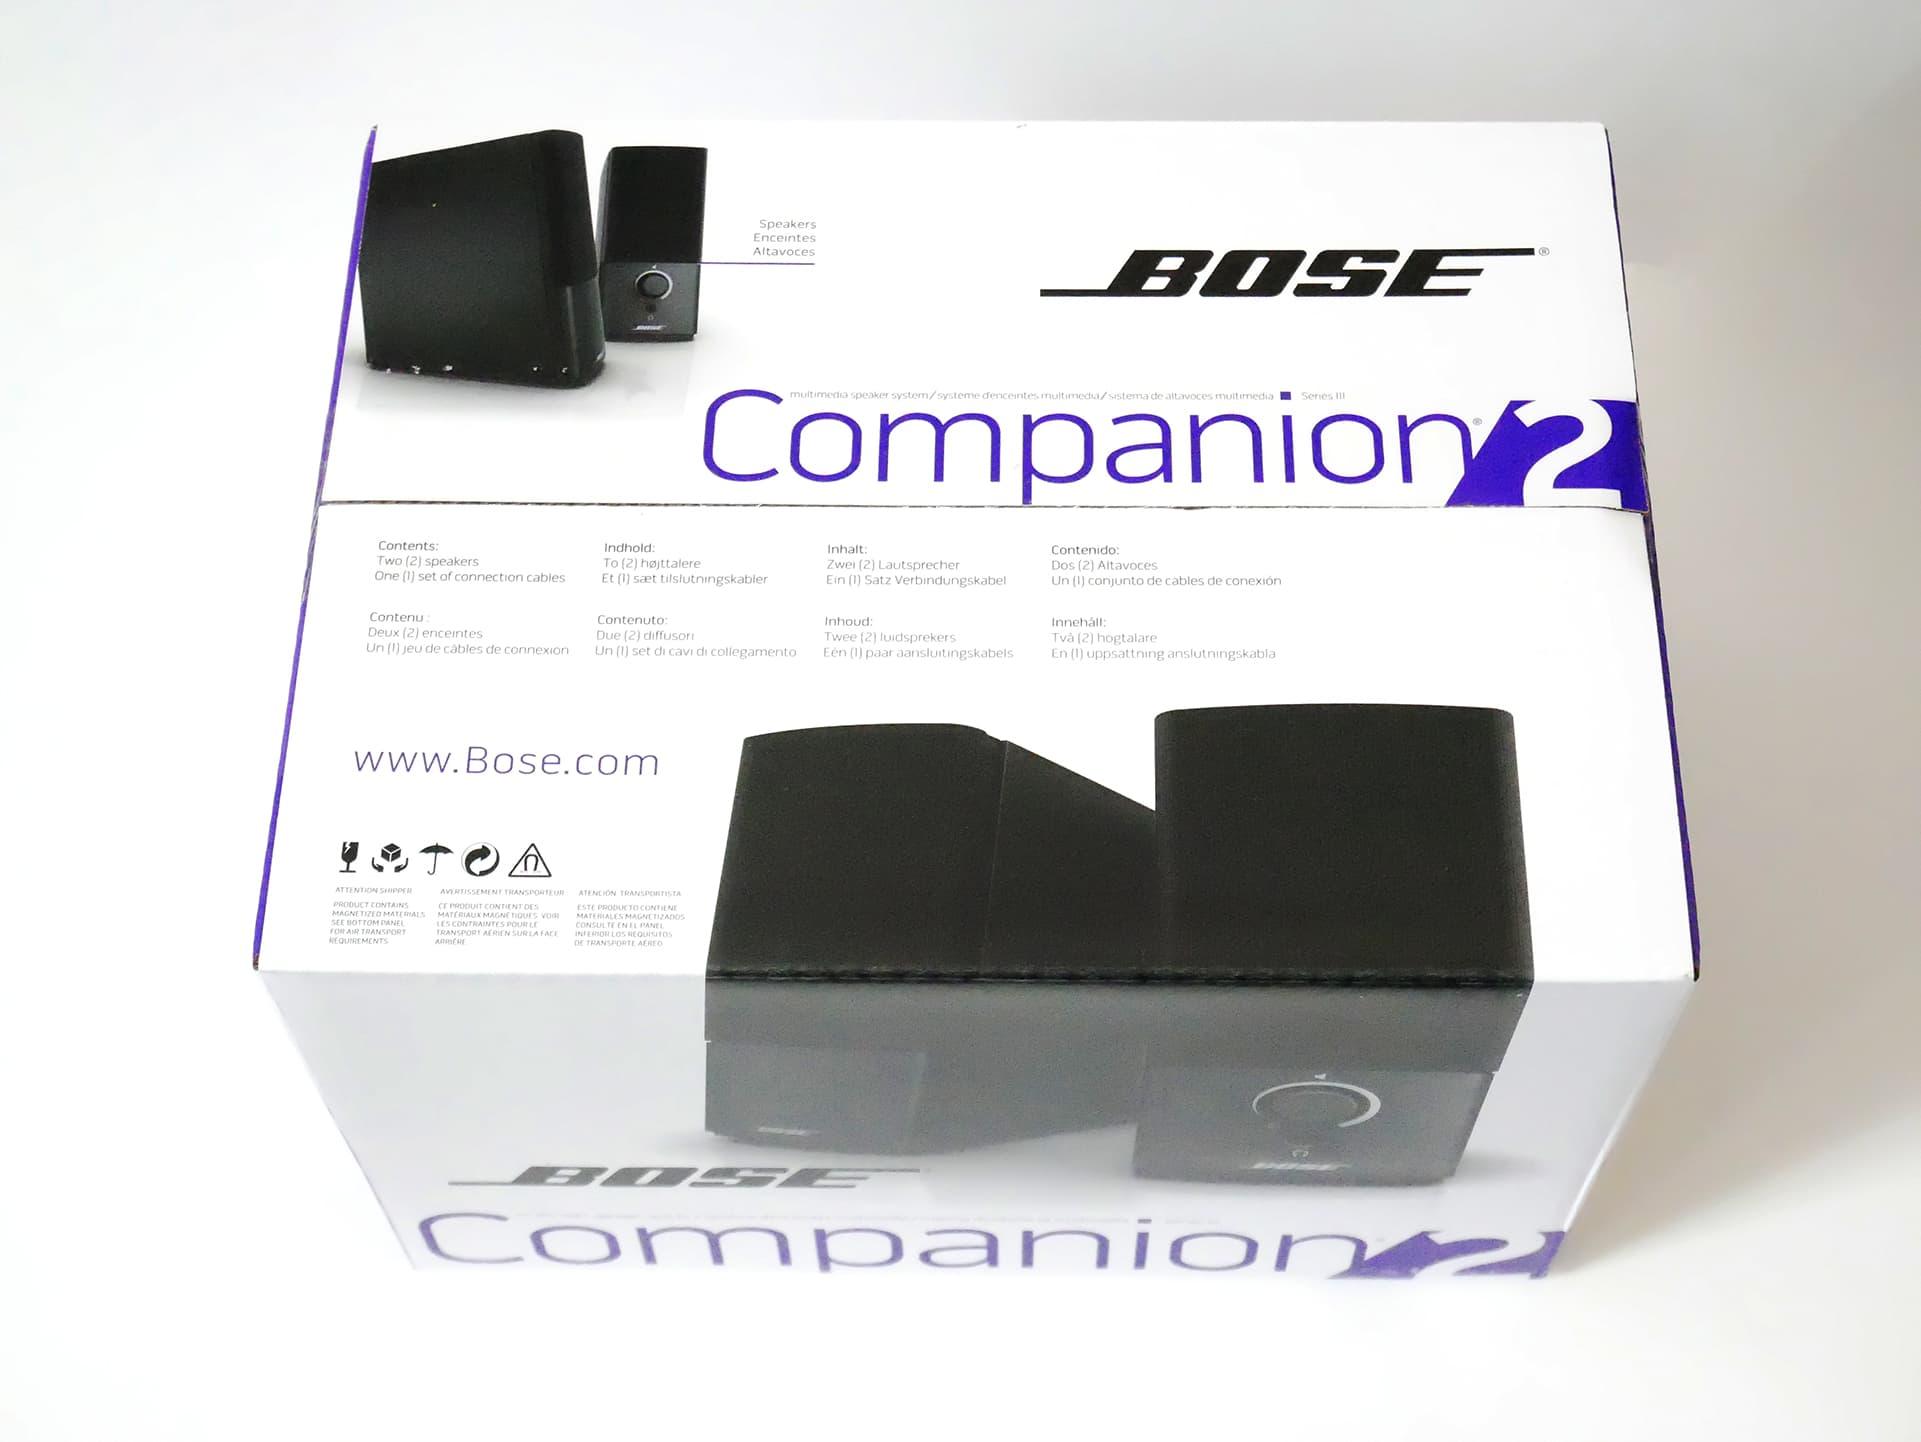 Bose Companion 2 Series III 外箱